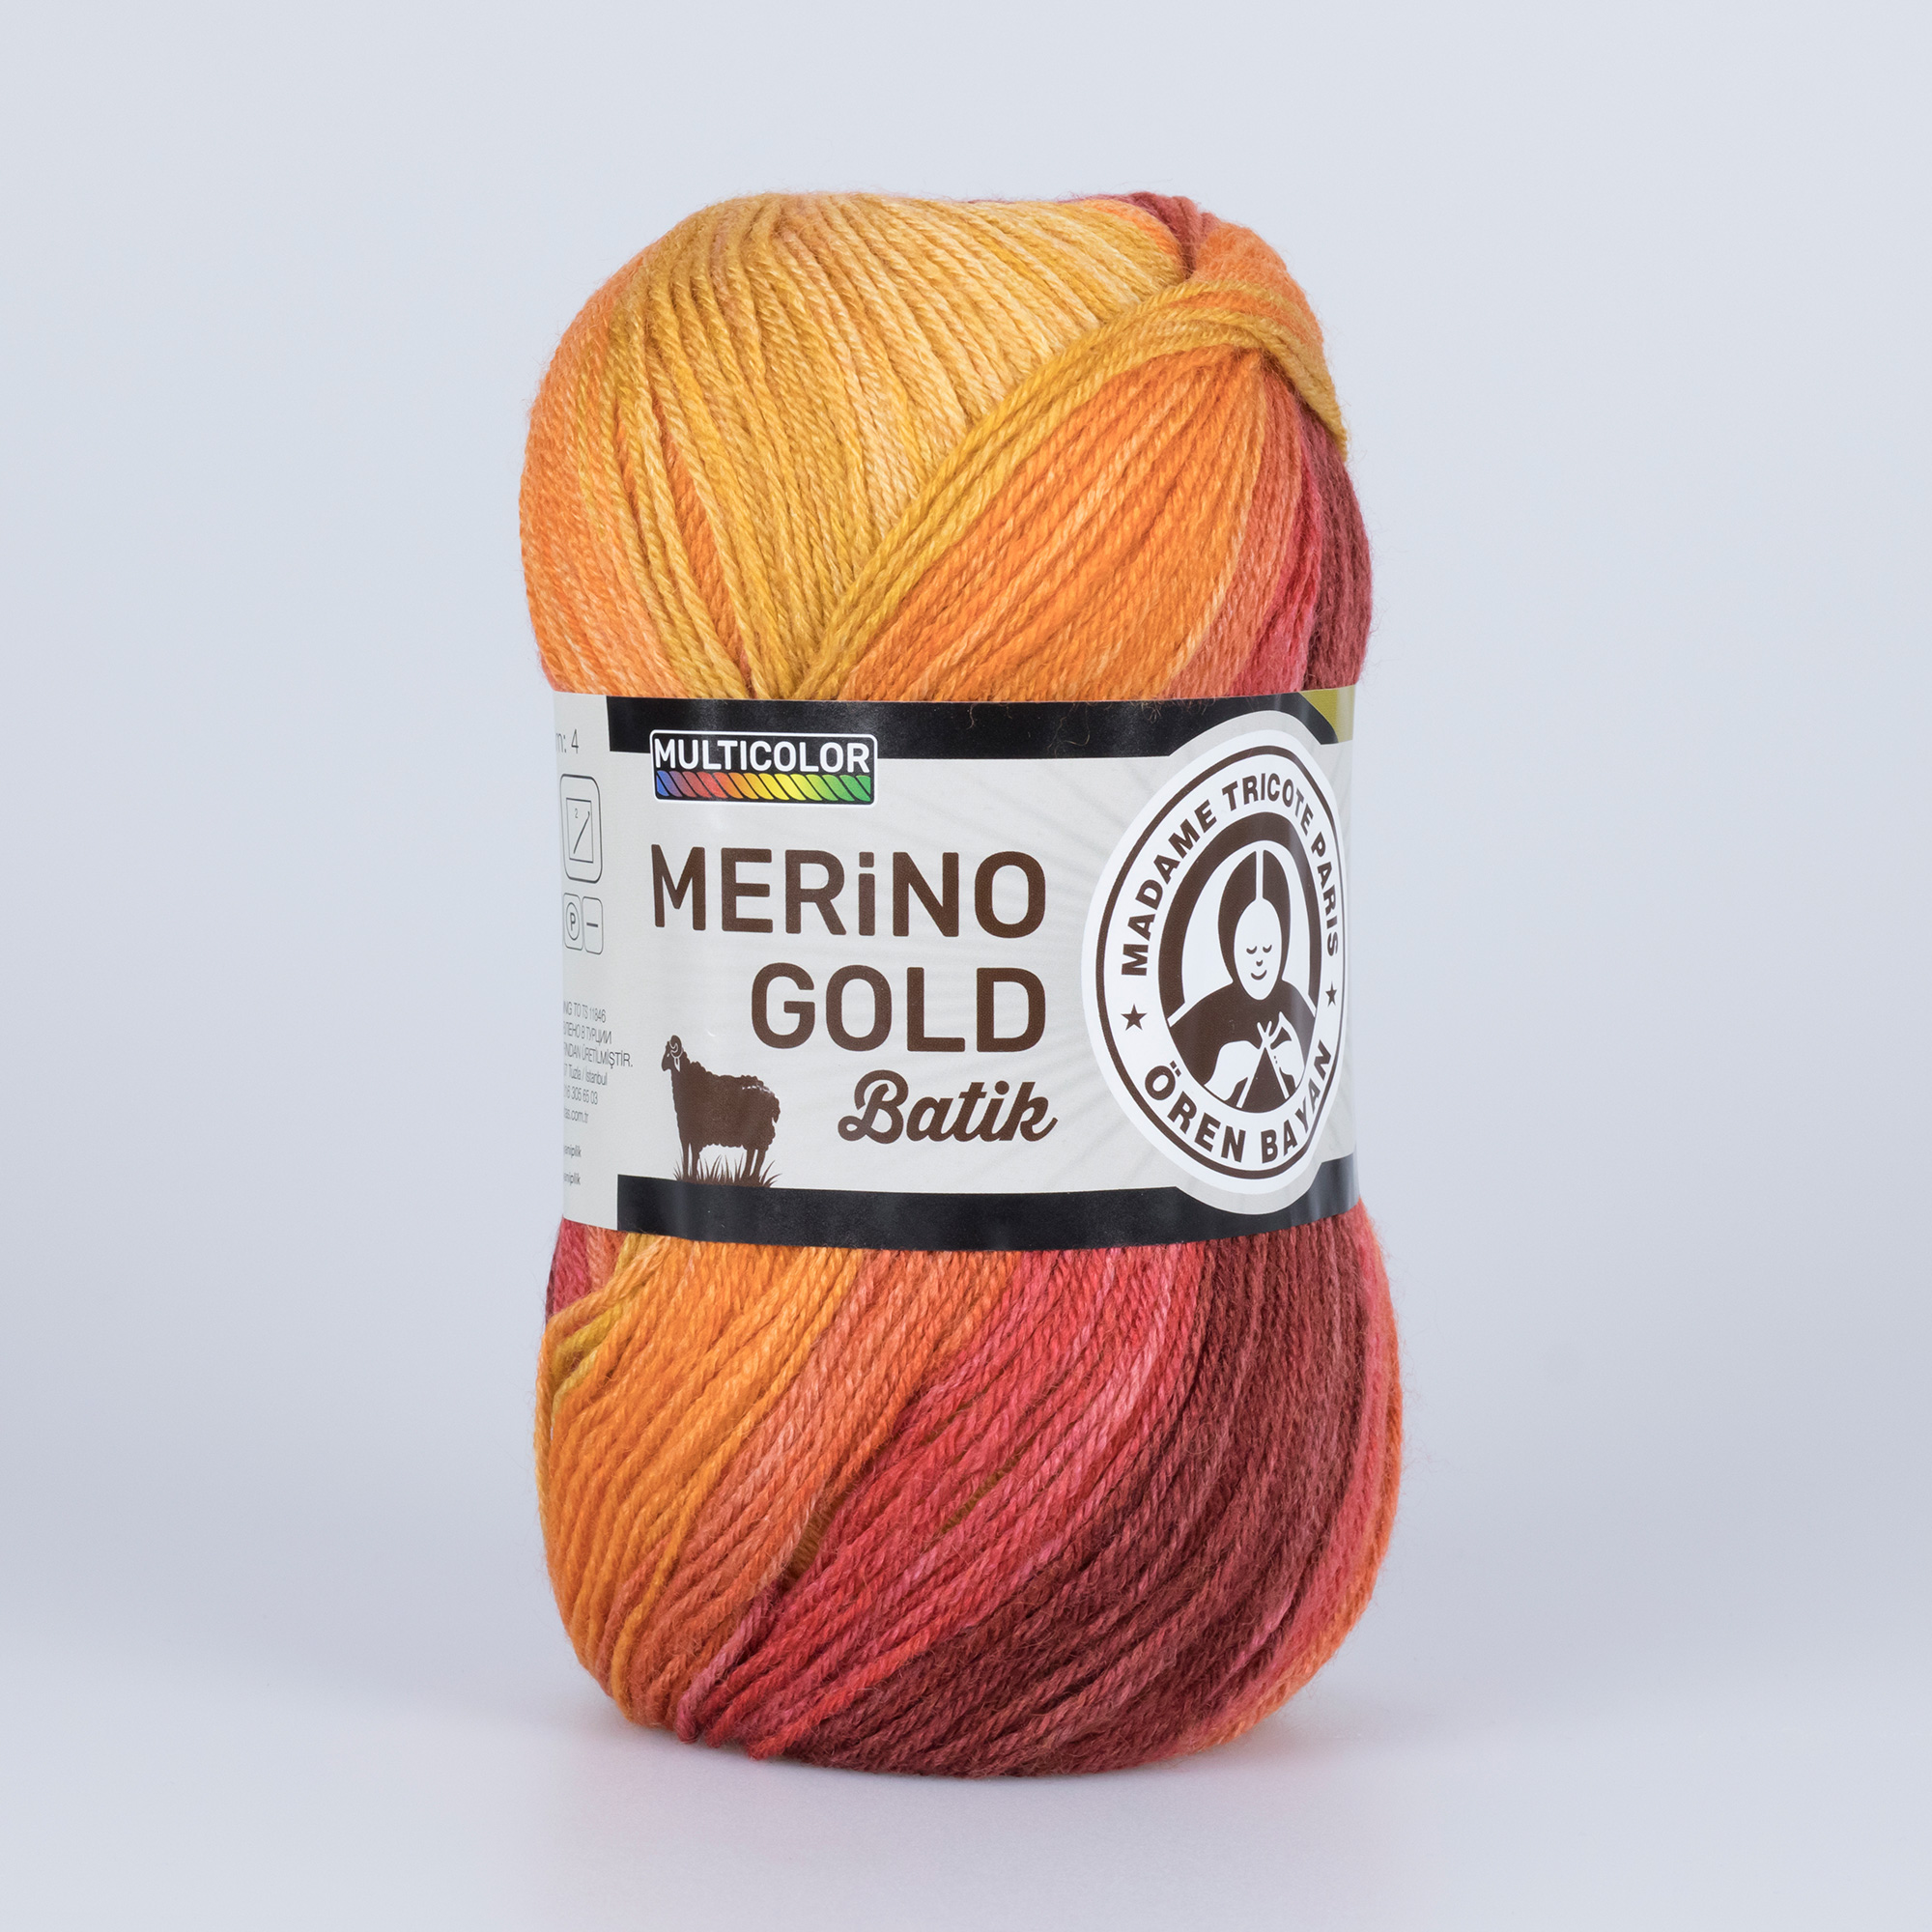 Merino Gold Batik